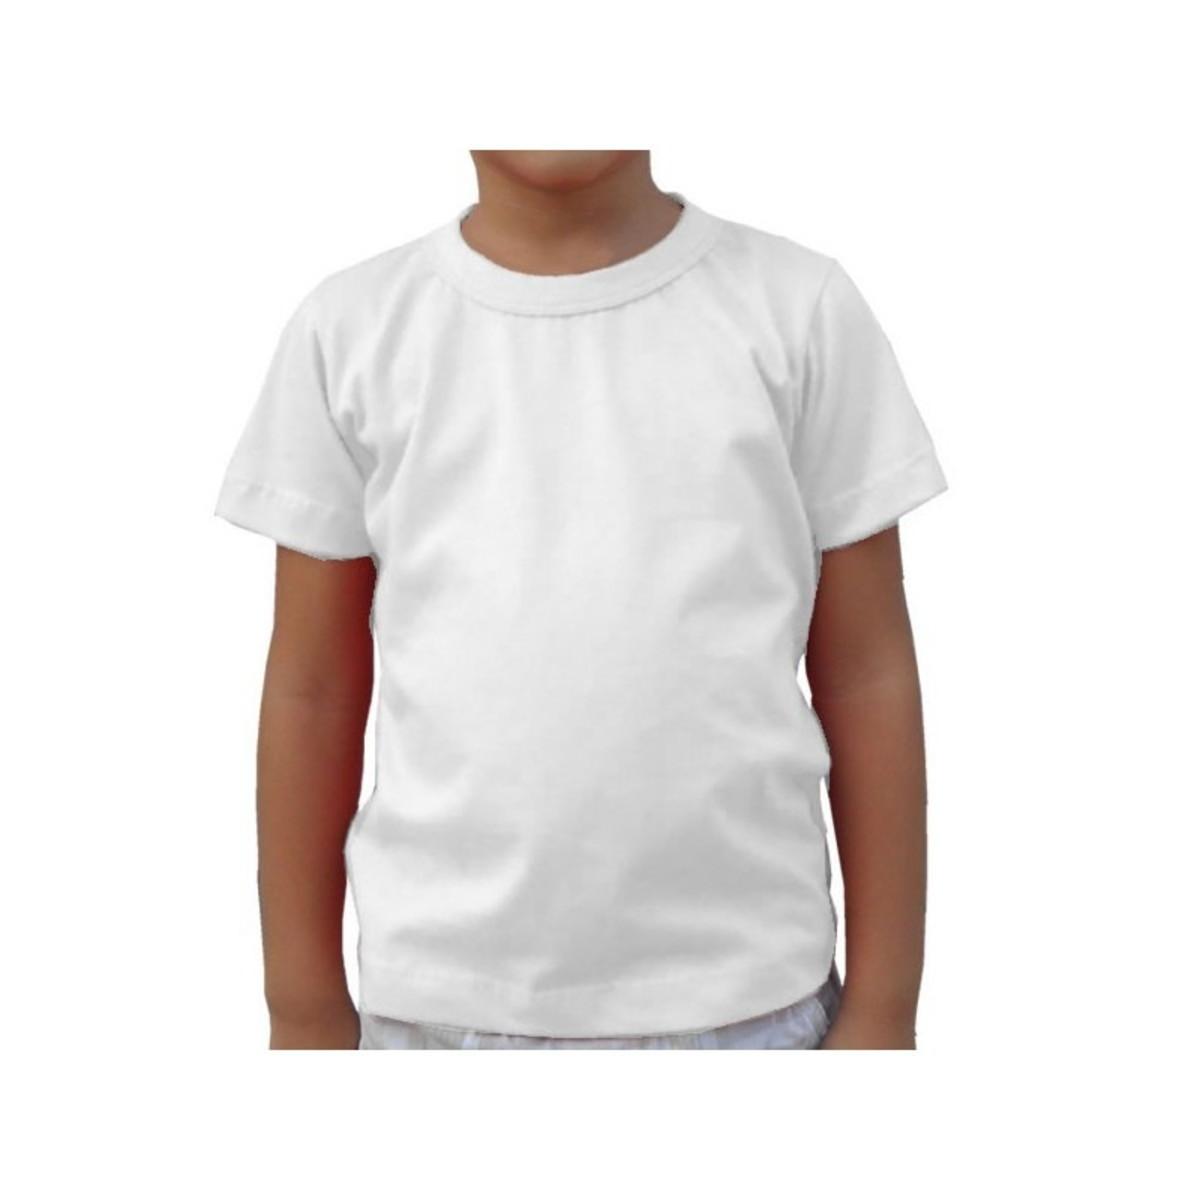 Camiseta infantíl 100% Poliéster Branca Infantil Sublimação no Elo7 ... 4f36202538283